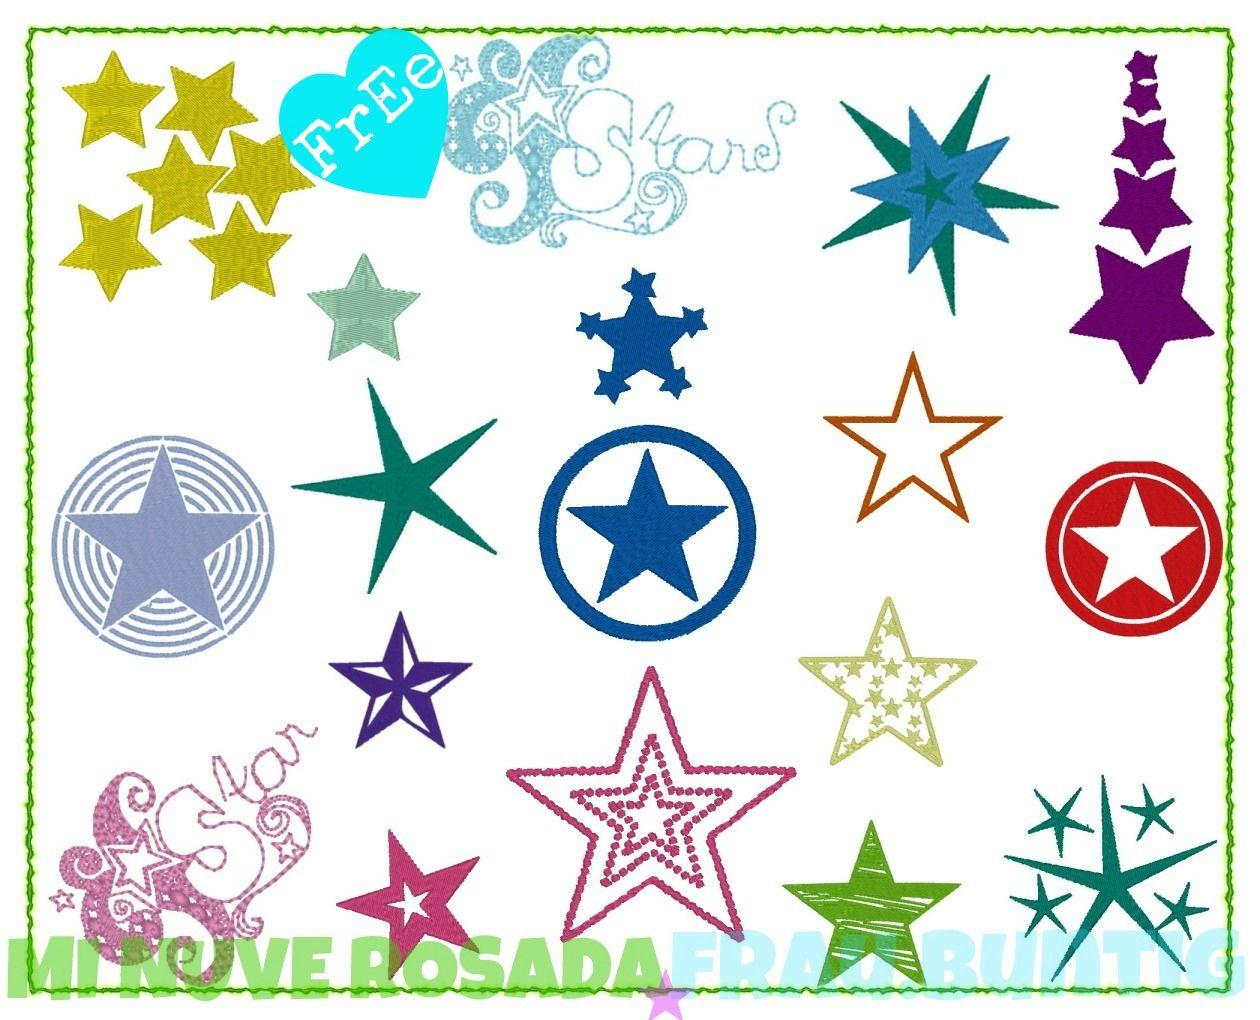 ☆ BUNTIG ☆: freebie | Plotter | Pinterest | Stickdateien, Plotten ...